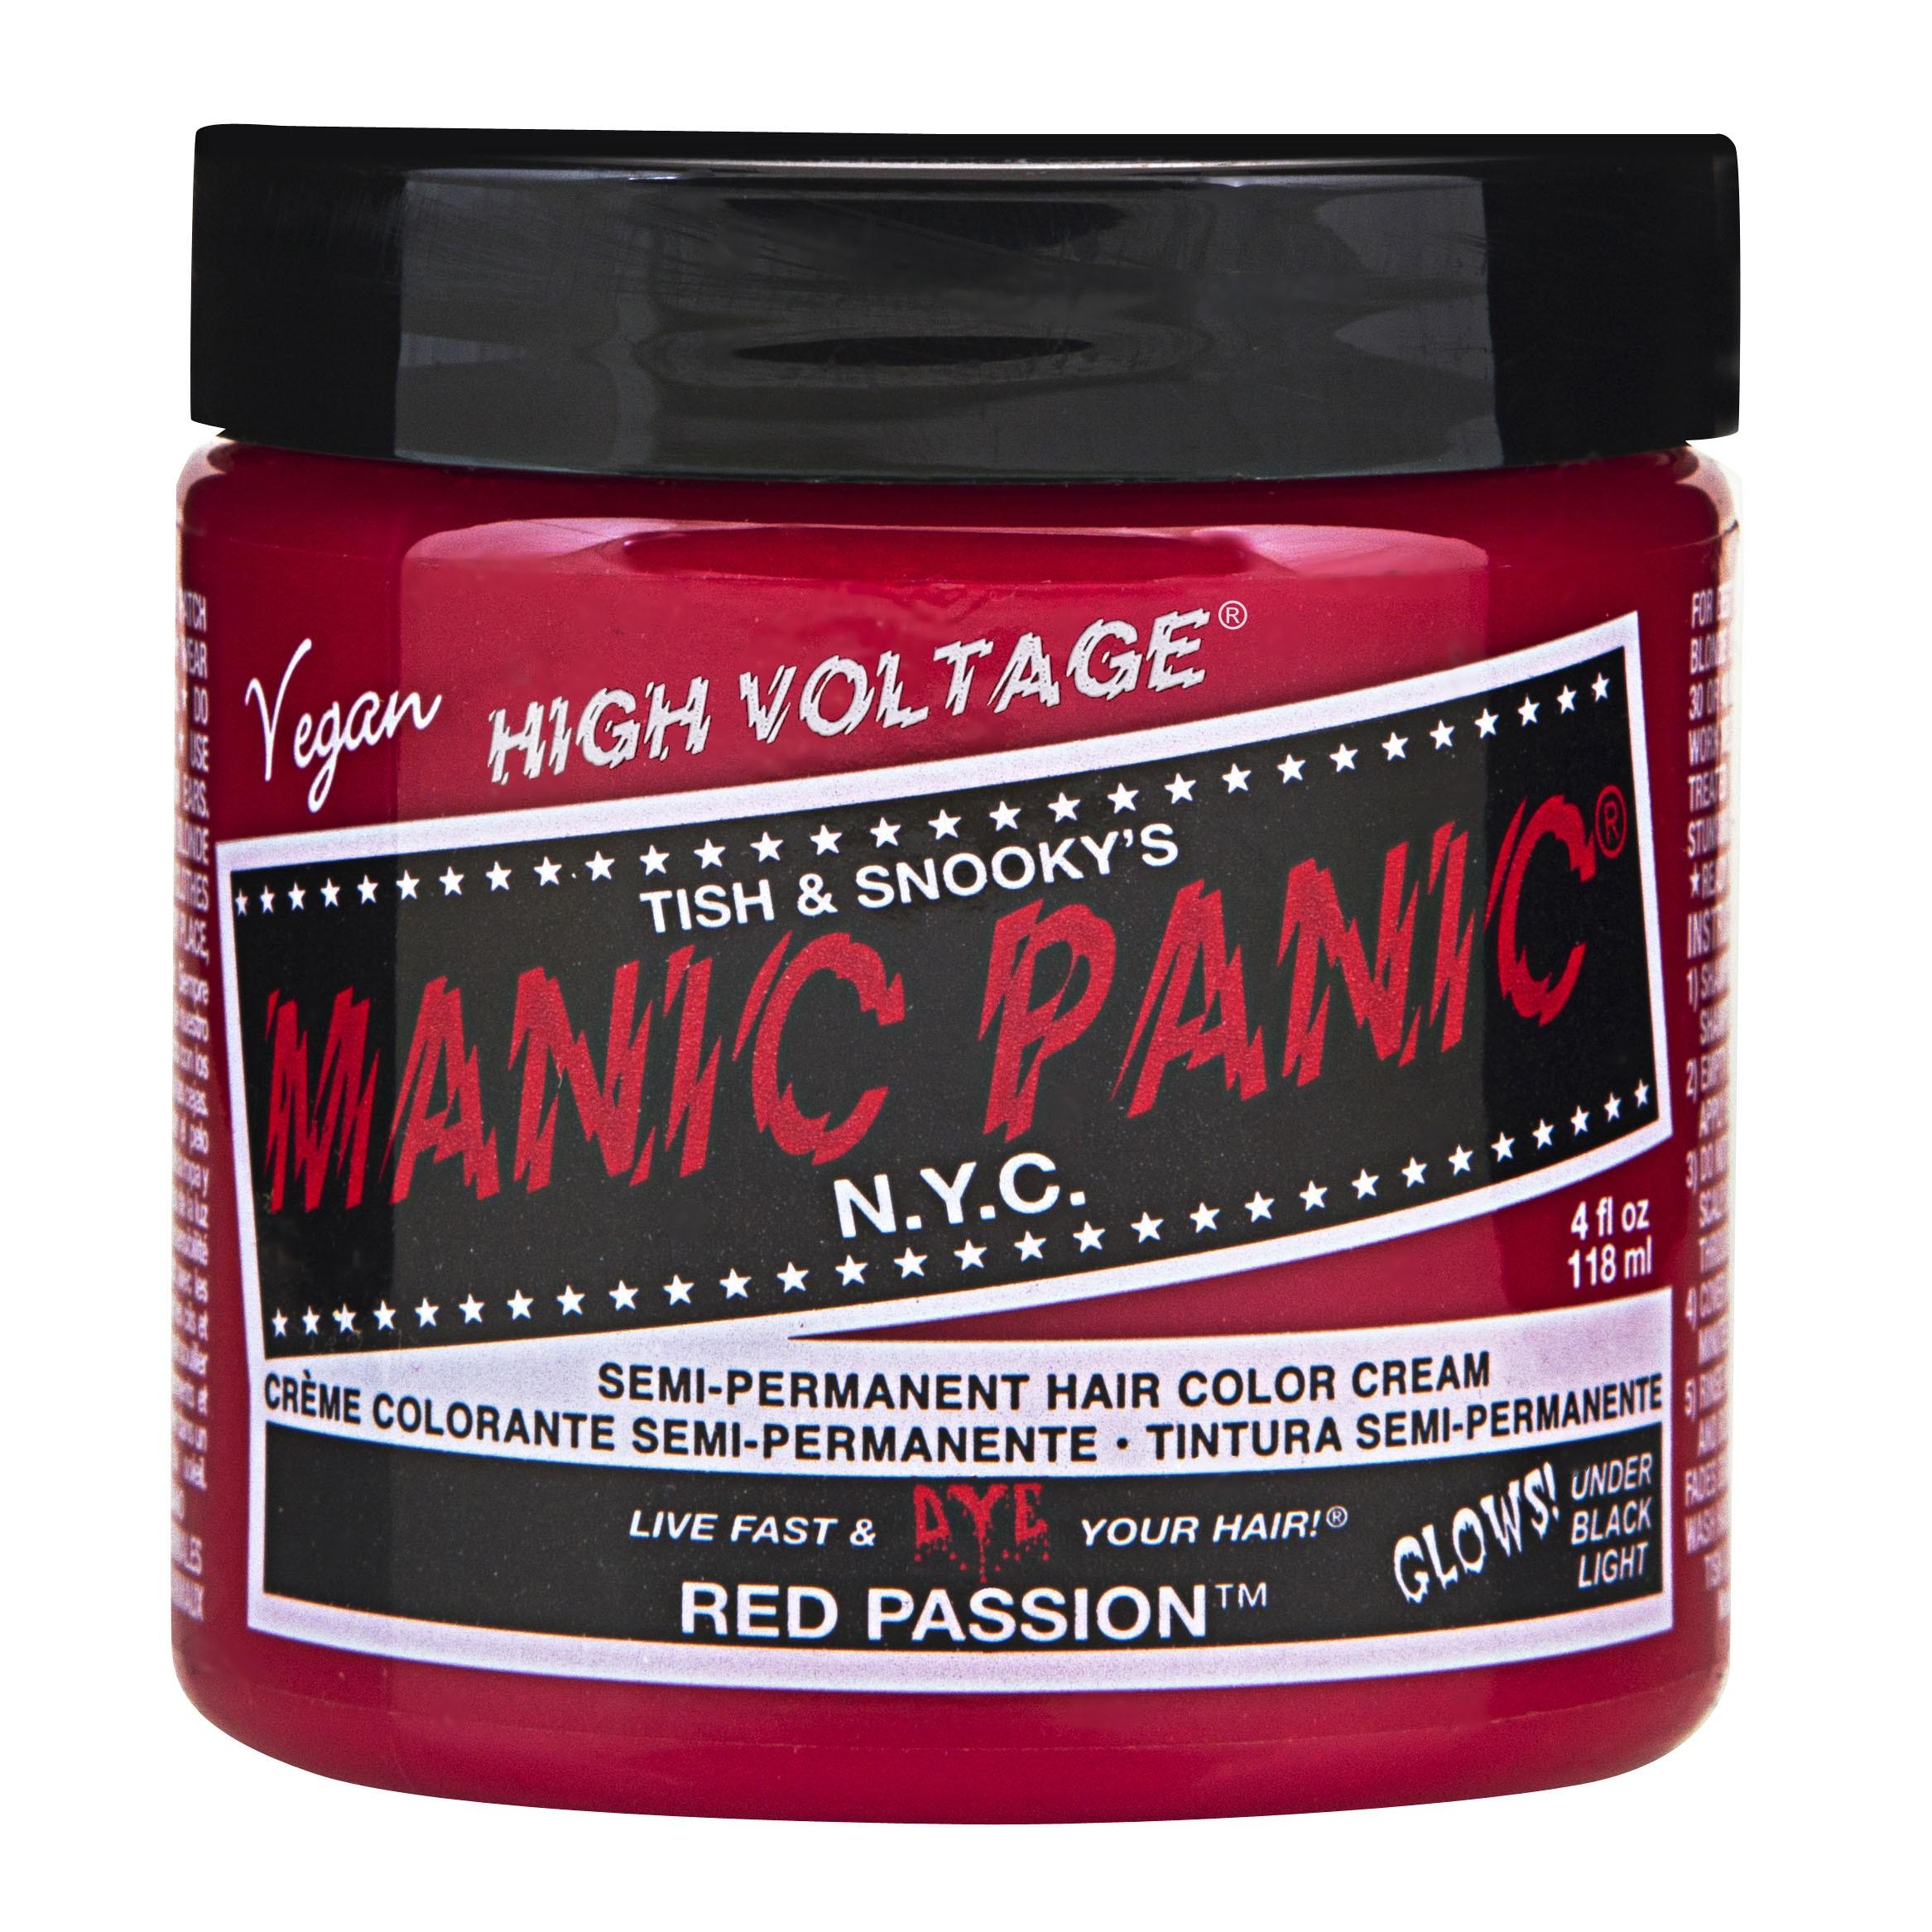 MANIC-PANIC-SEMI-PERMANENT-HAIR-COLOR-DYE-CREAM-4OZ-CLASSIC-amp-CREAMTONE-PASTEL